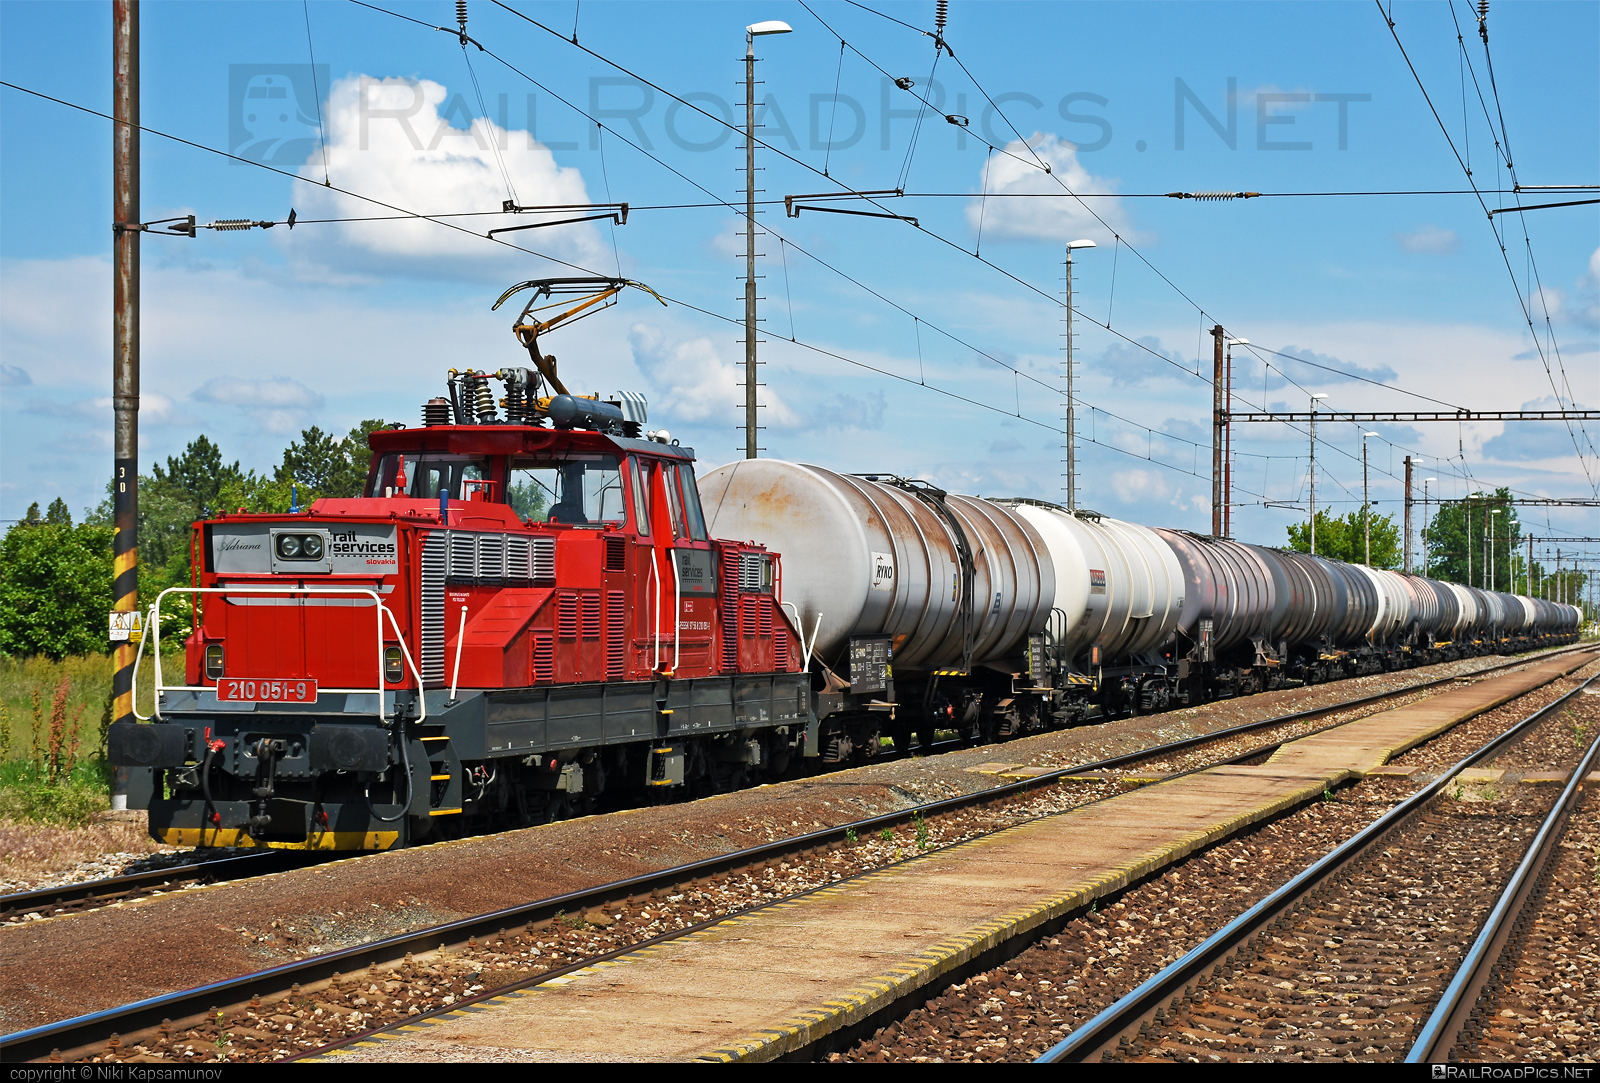 Škoda 51E - 210 051-9 operated by Rail Services Slovakia, s.r.o. #RailServicesSlovakia #kesselwagen #locomotive210 #rsssk #skoda #skoda51e #tankwagon #zehlicka